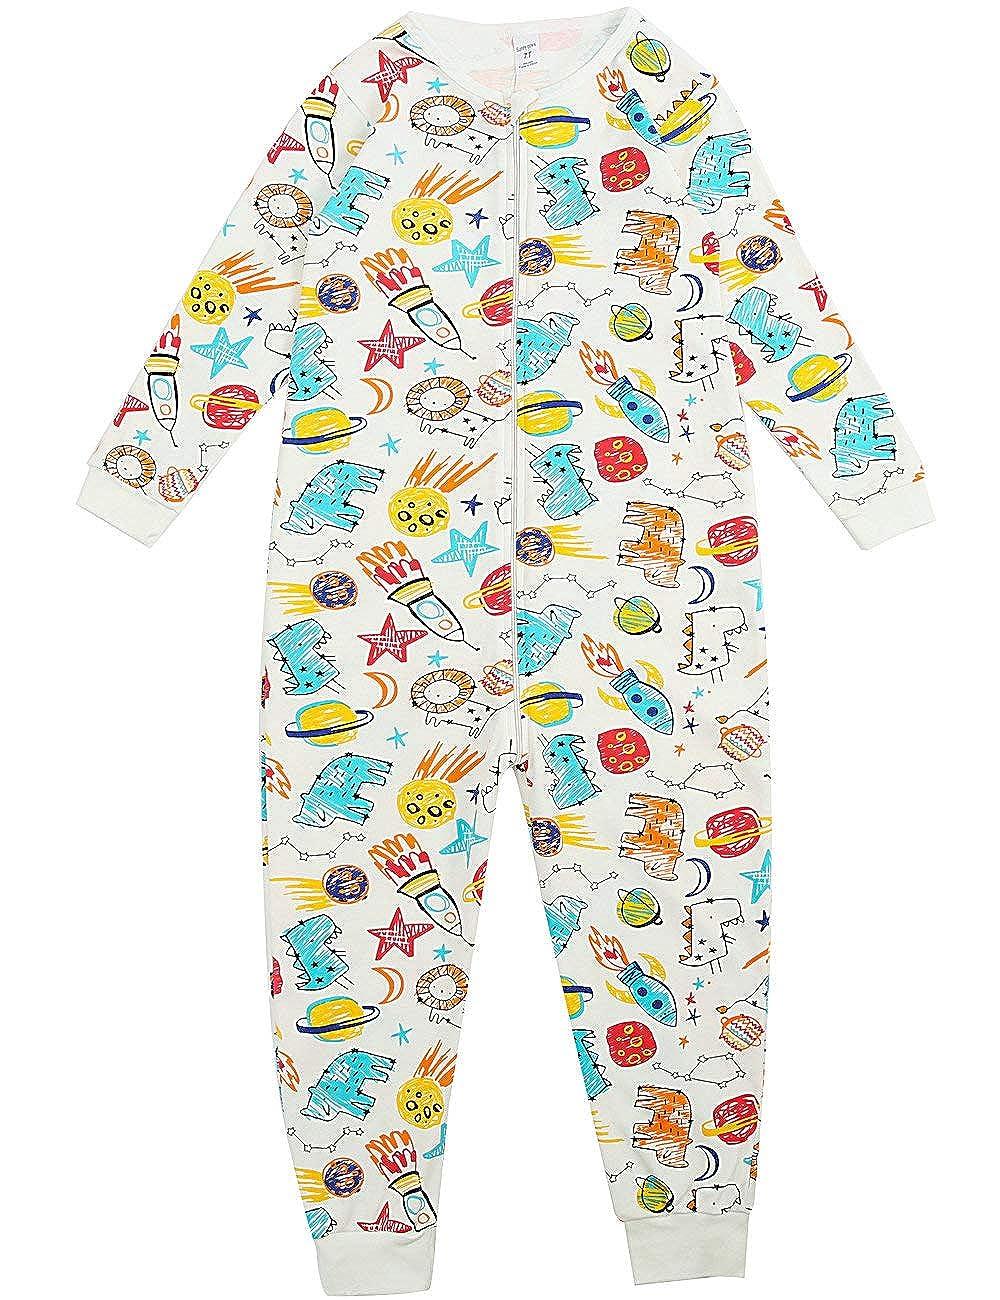 ffef0e540 Amazon.com  Sunnycows Kids Onesie Pajamas Cotton Easy Zip Open One ...